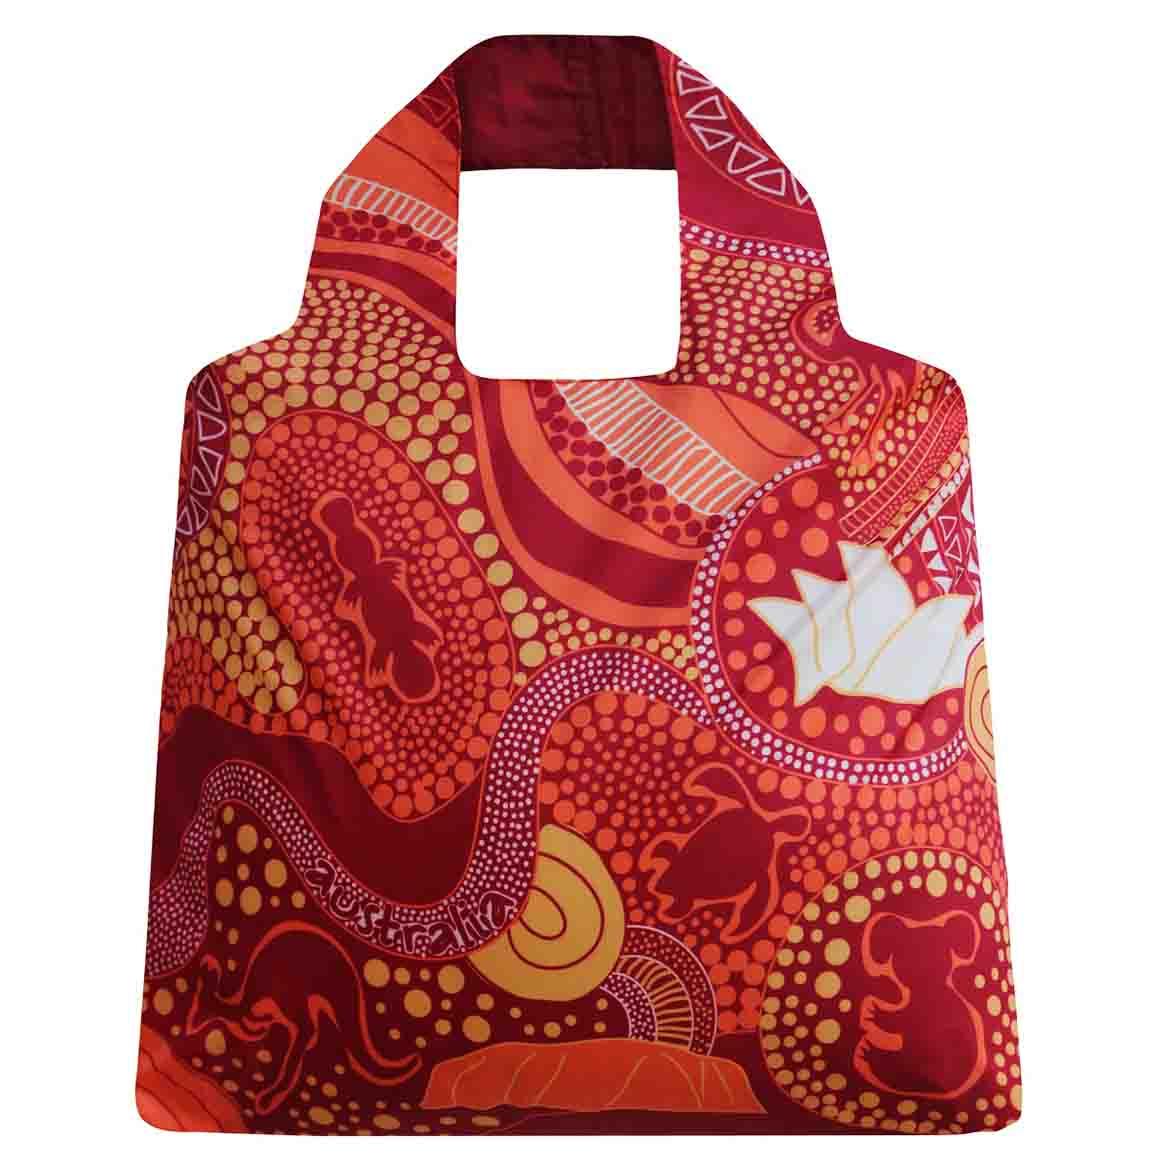 Dream time SAKitToMe Foldable Shopping Bag  | Trada Marketplace